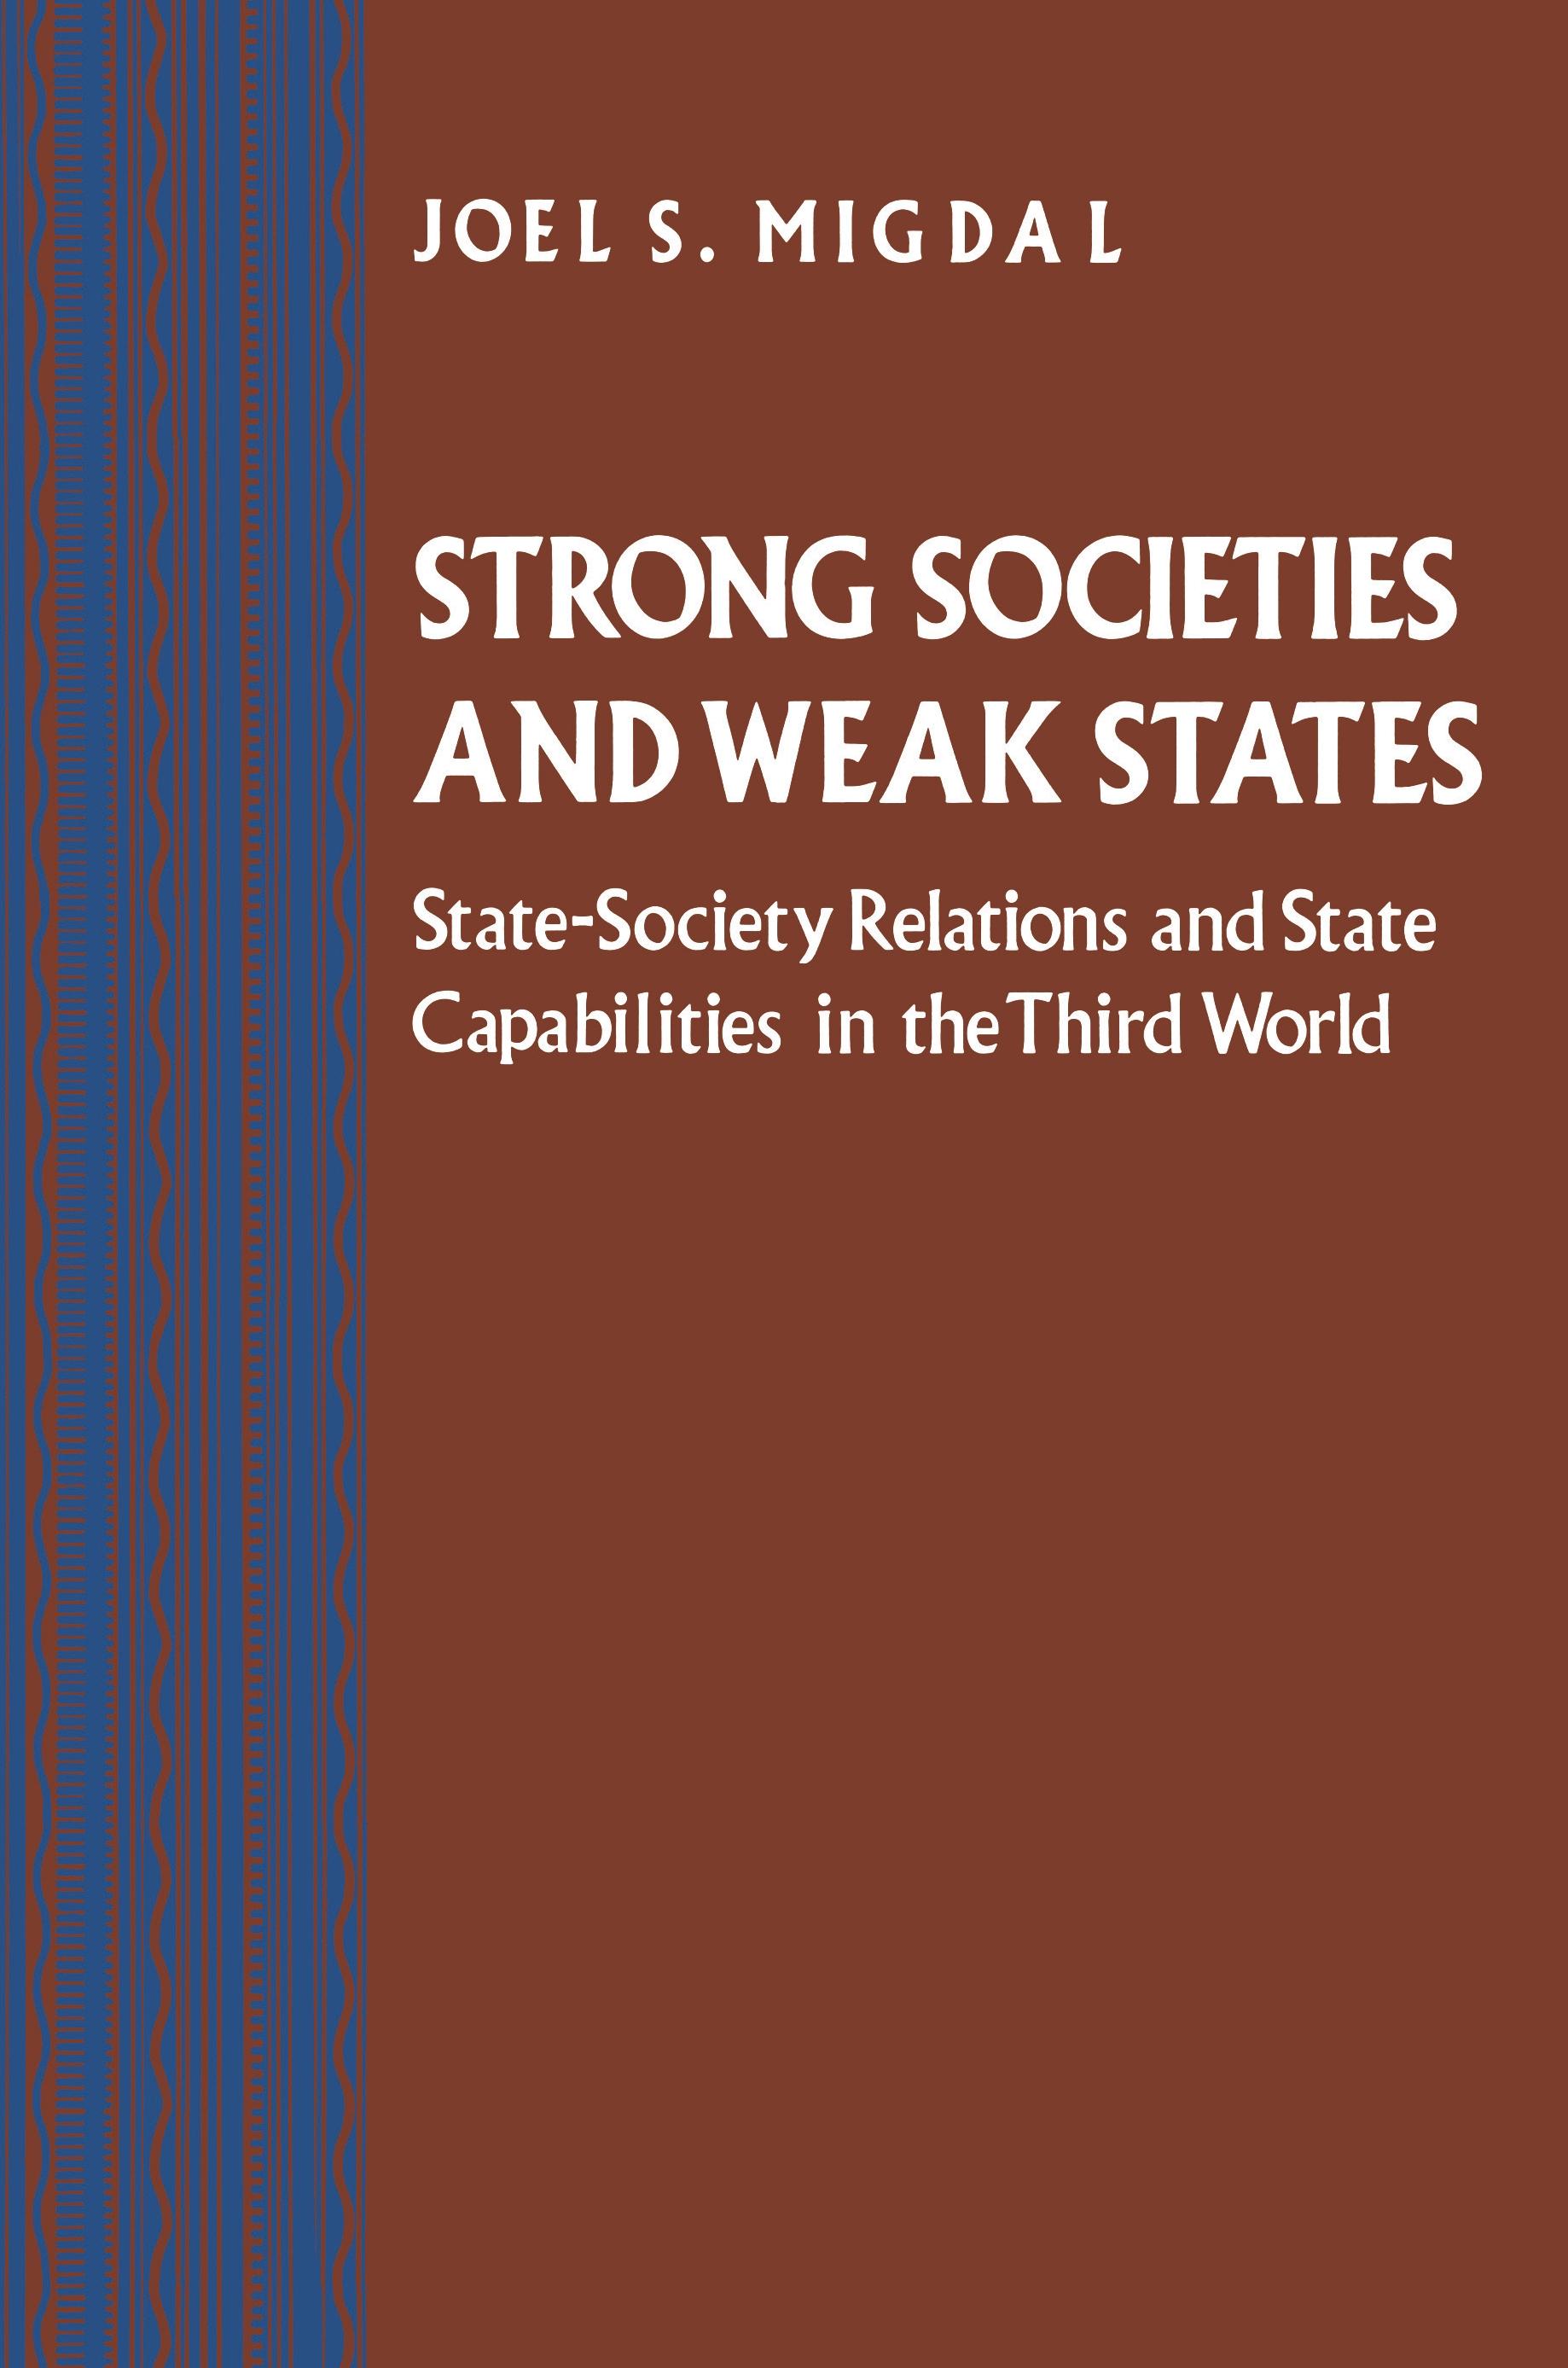 Strong Societies and Weak States | Princeton University Press